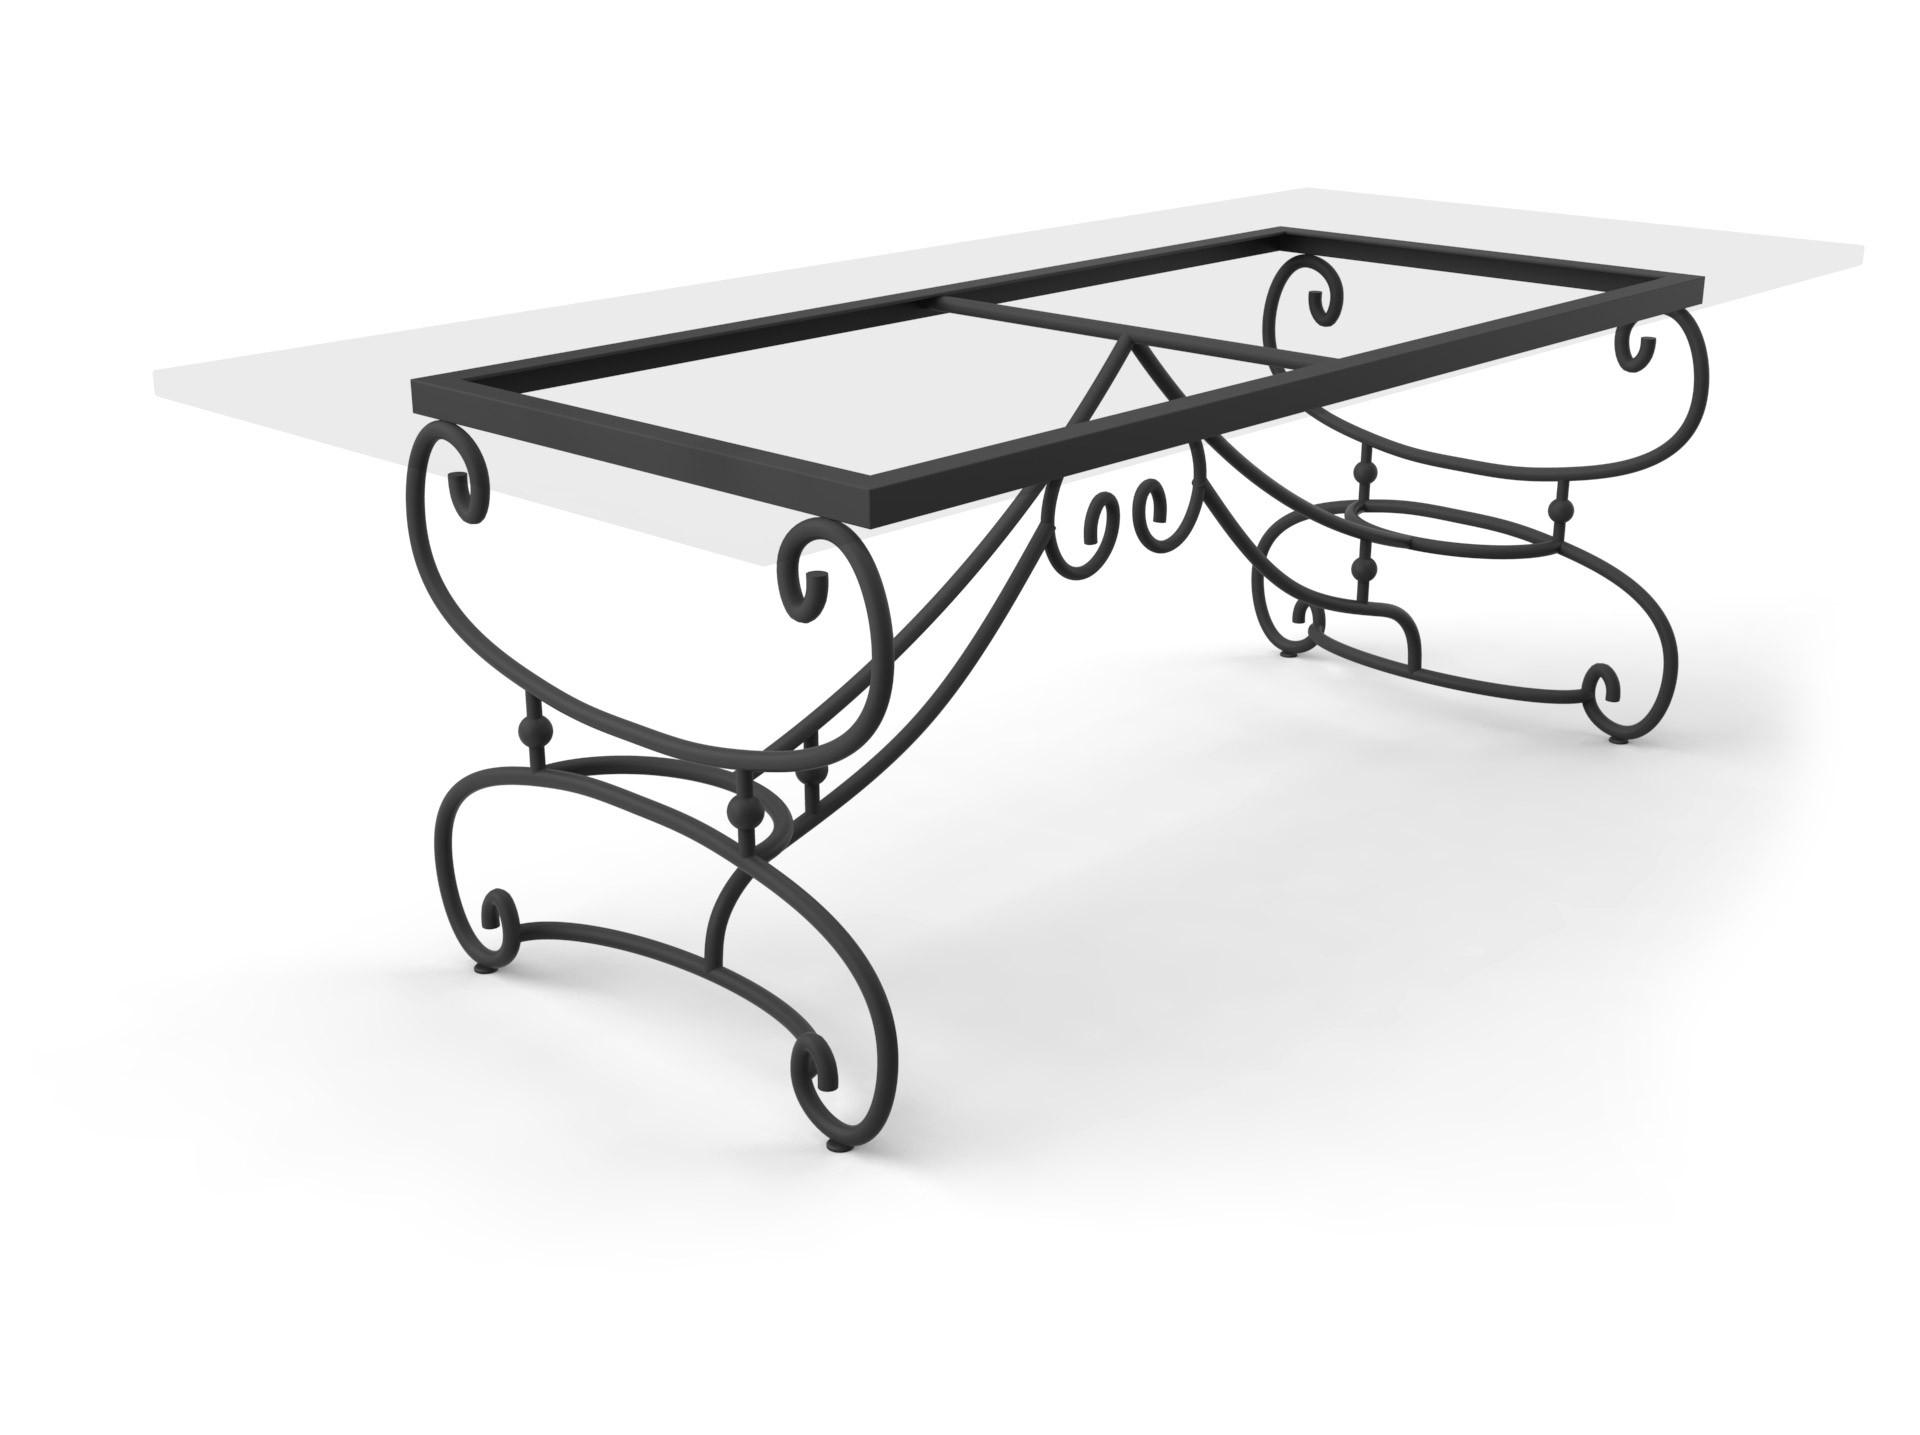 Tischgestell Classic